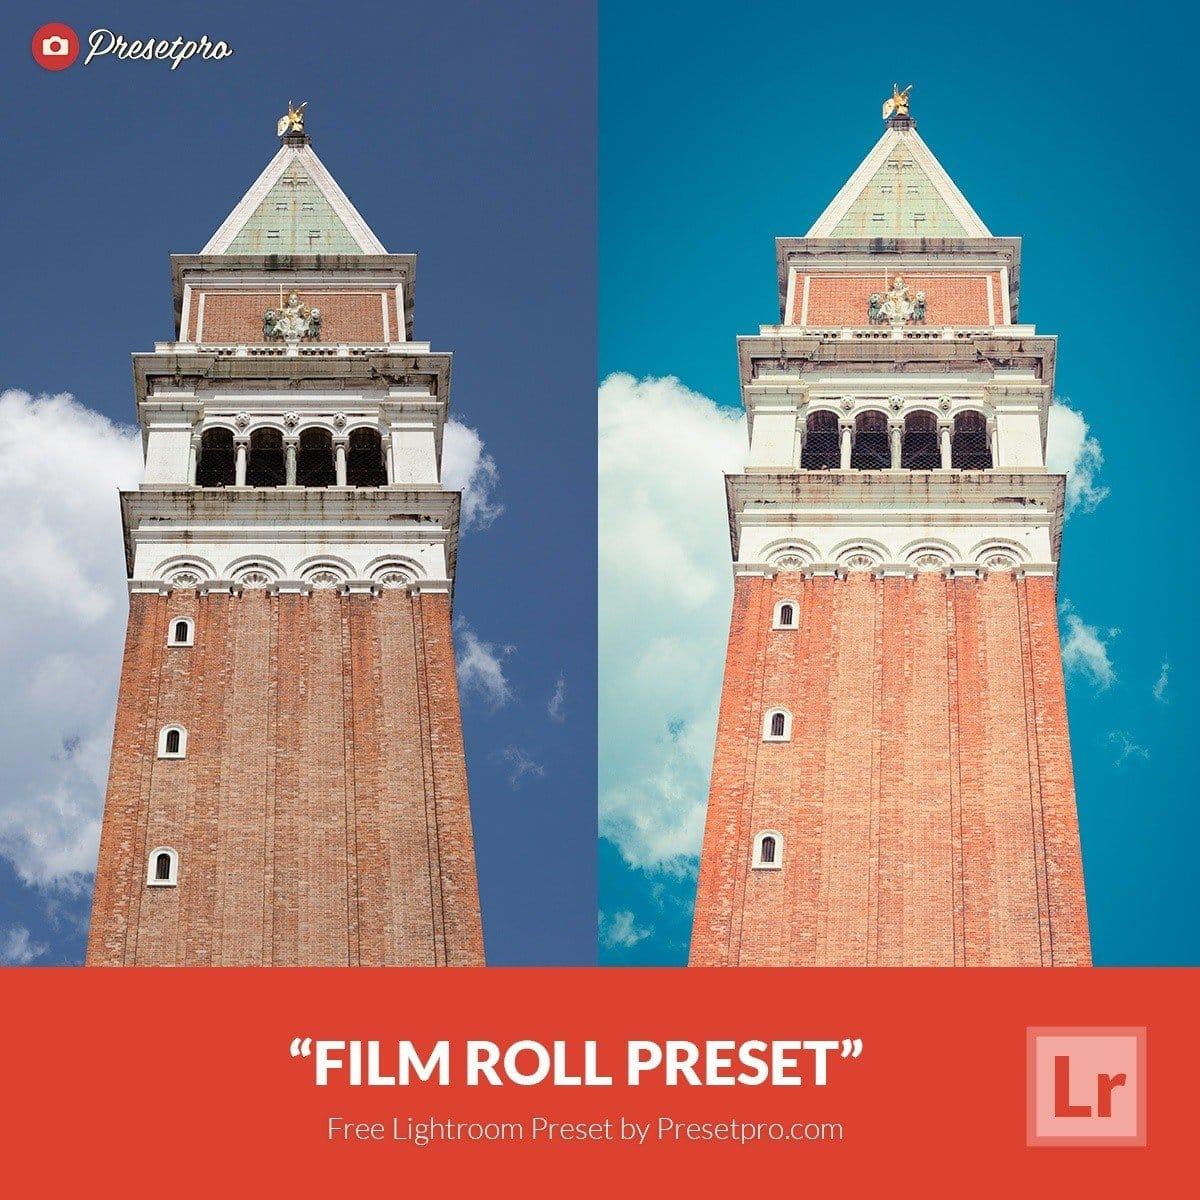 Free-Lightroom-Preset-Film-Roll